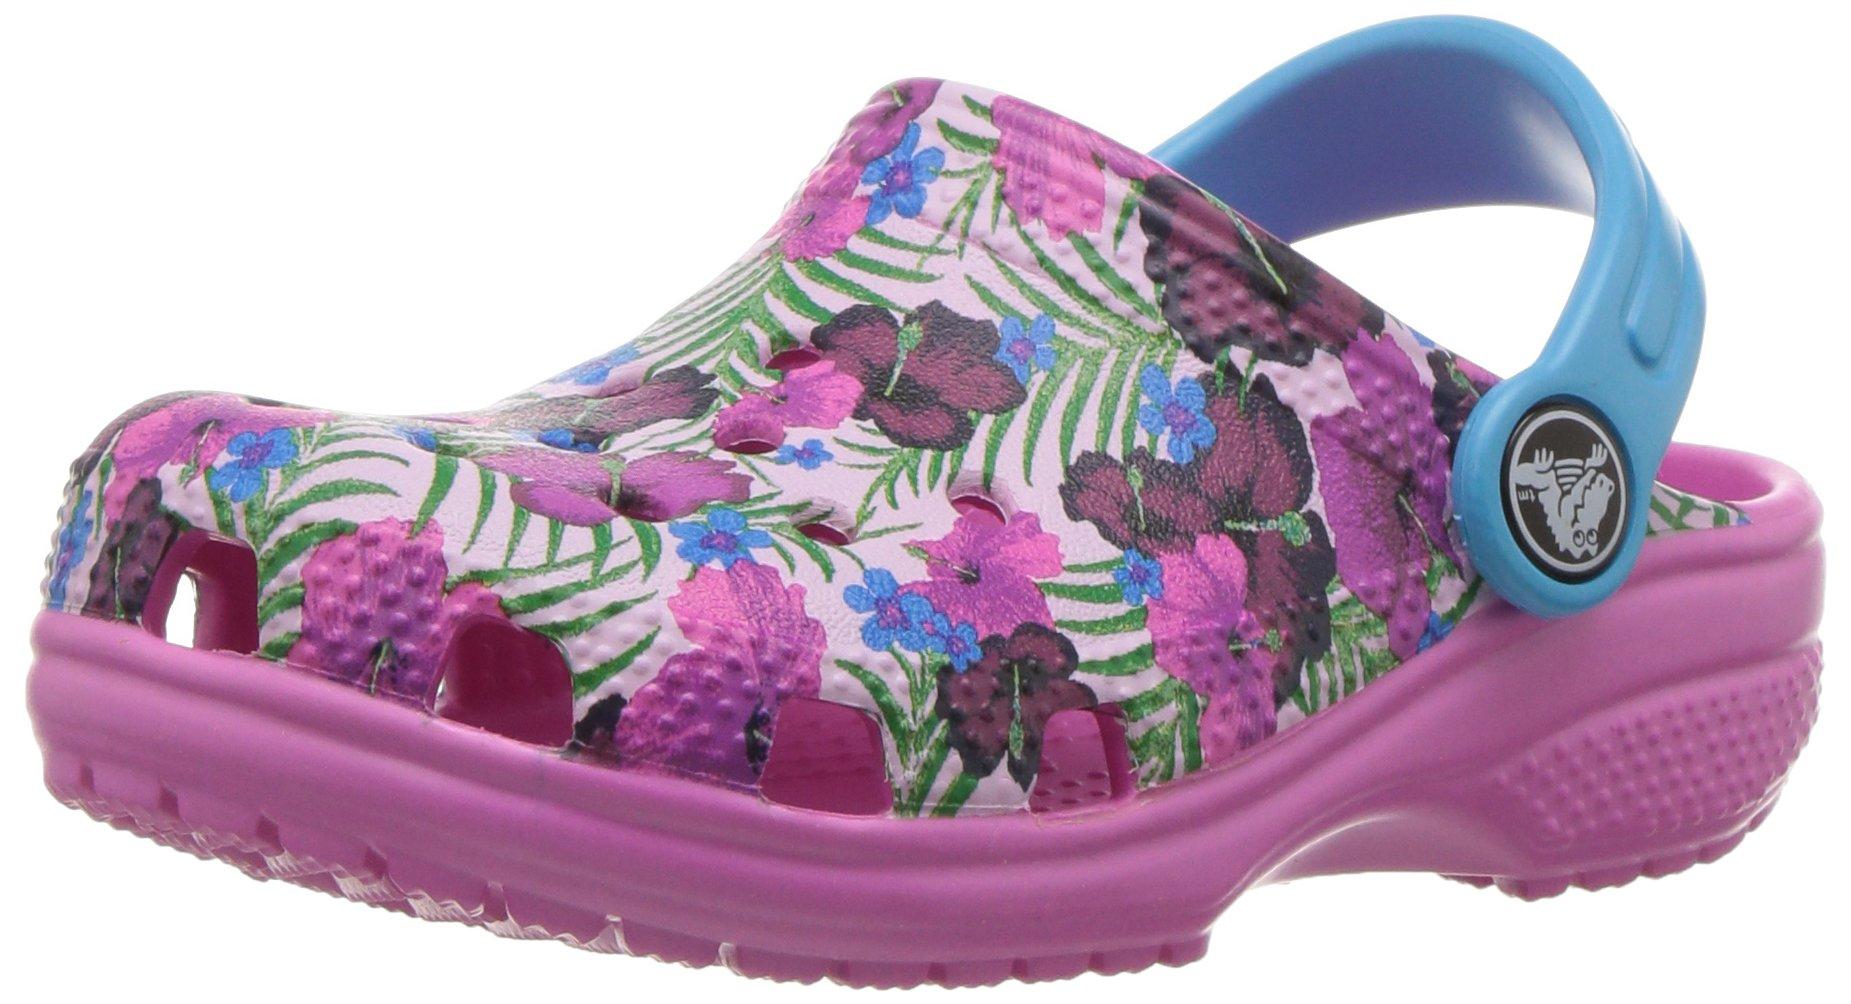 Crocs Kids' Classic Graphic K Clog,Multi Color/Pink,3 M US Little Kid